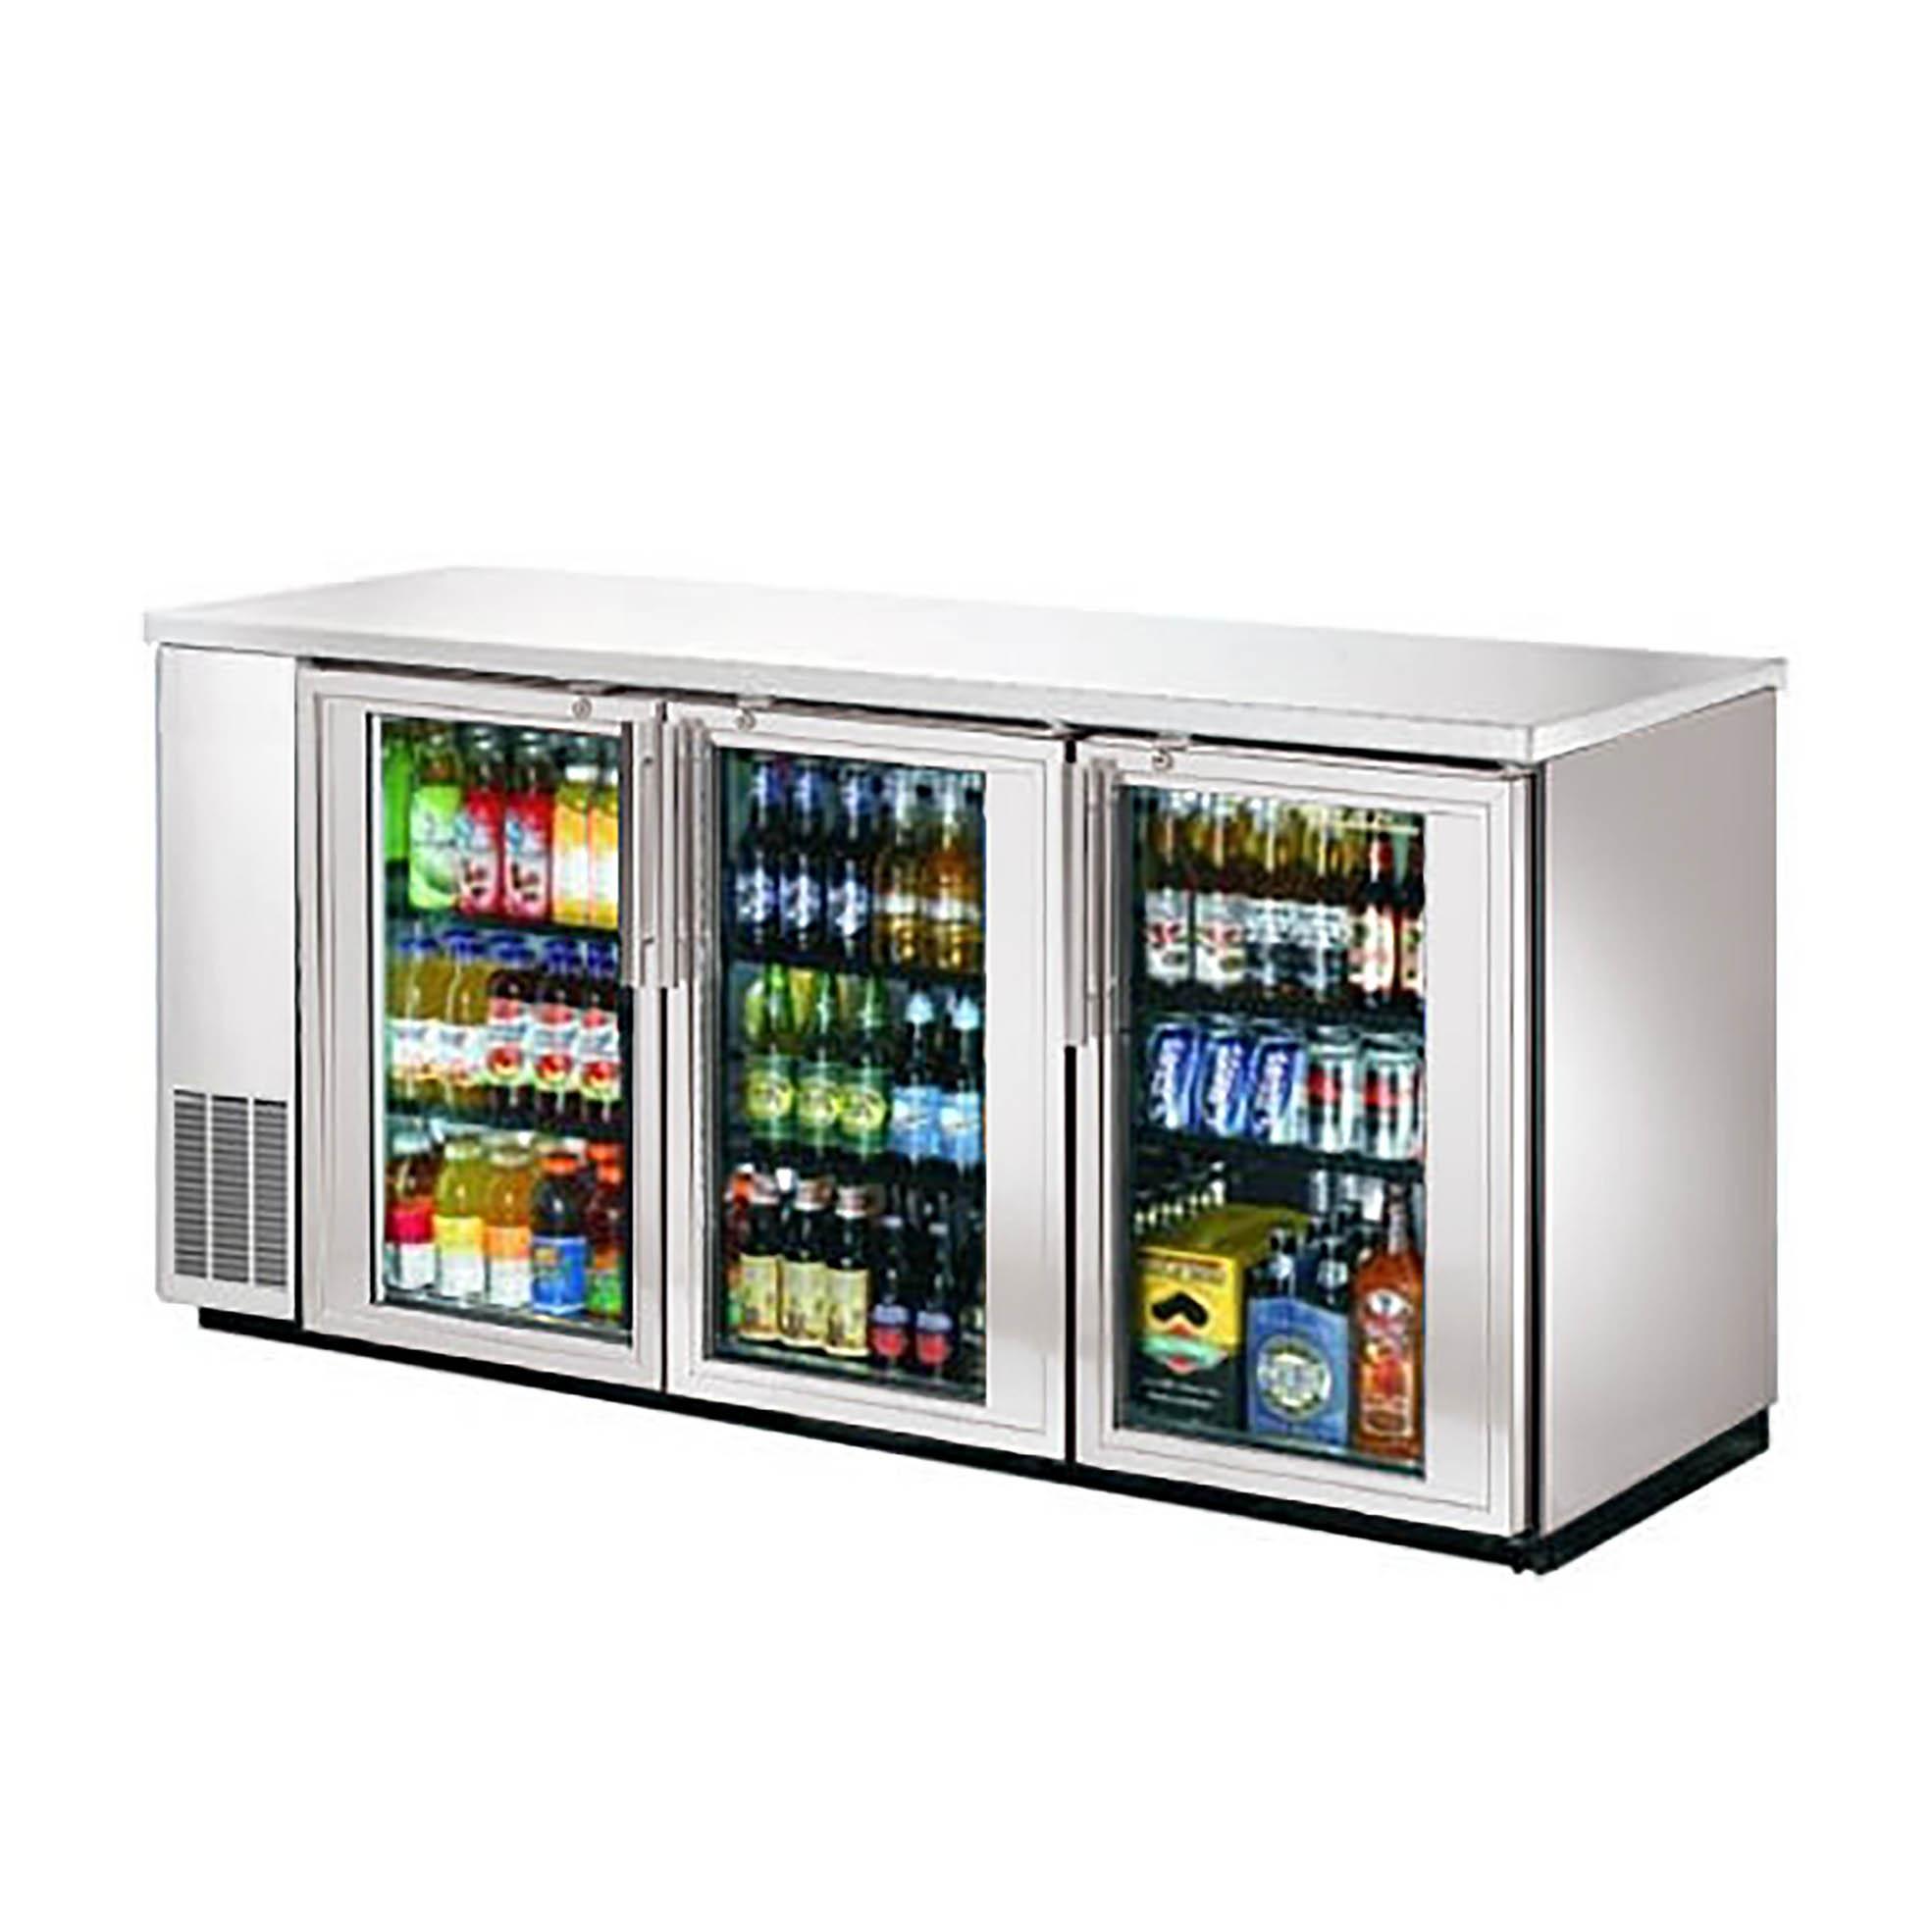 Efi Cbbsgd3 72cc 72 3 Door Glass Stainless Back Bar Refrigerator